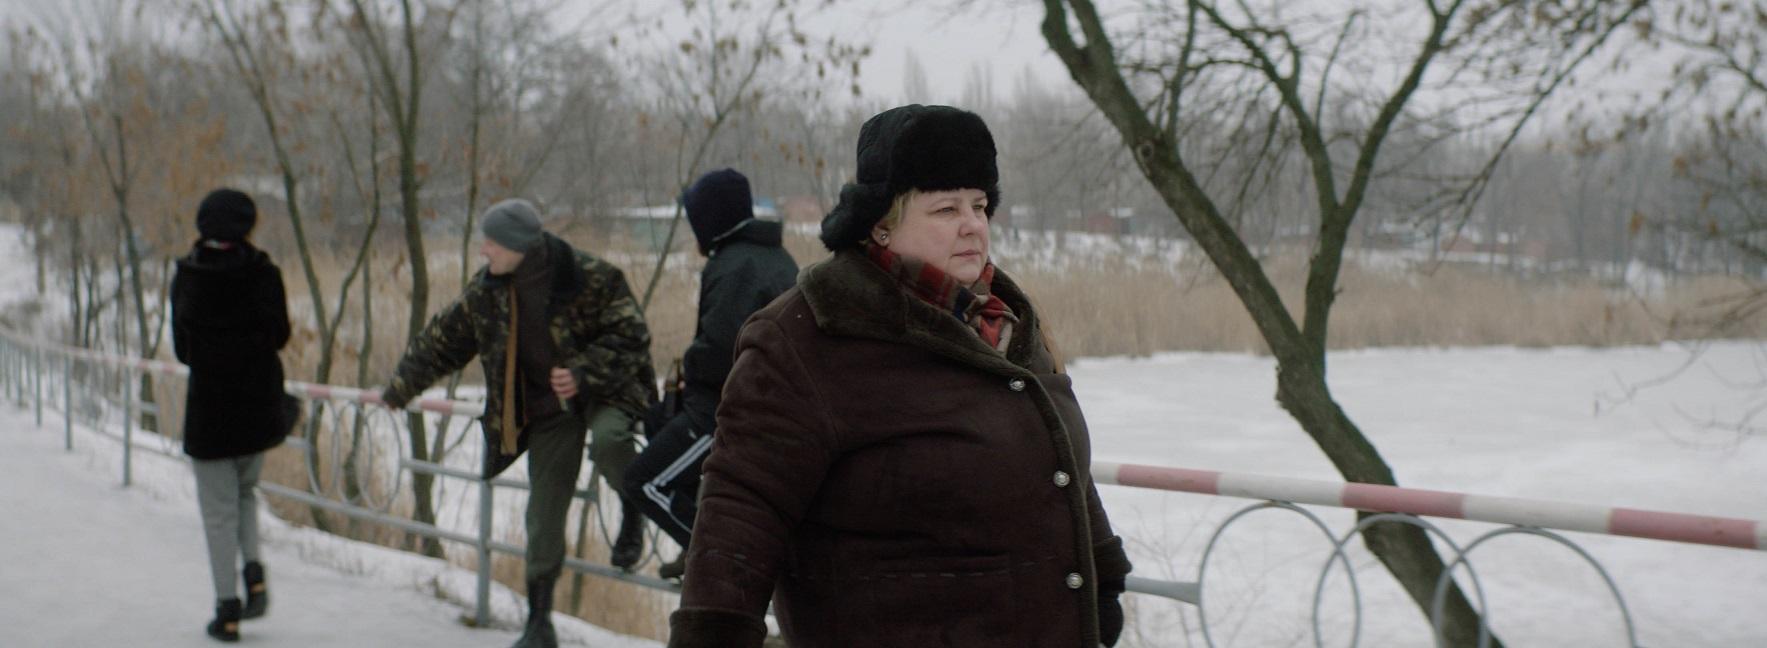 ?? З Донбасу в Канни: «Анна» побореться за «Золоту пальмову гілку»